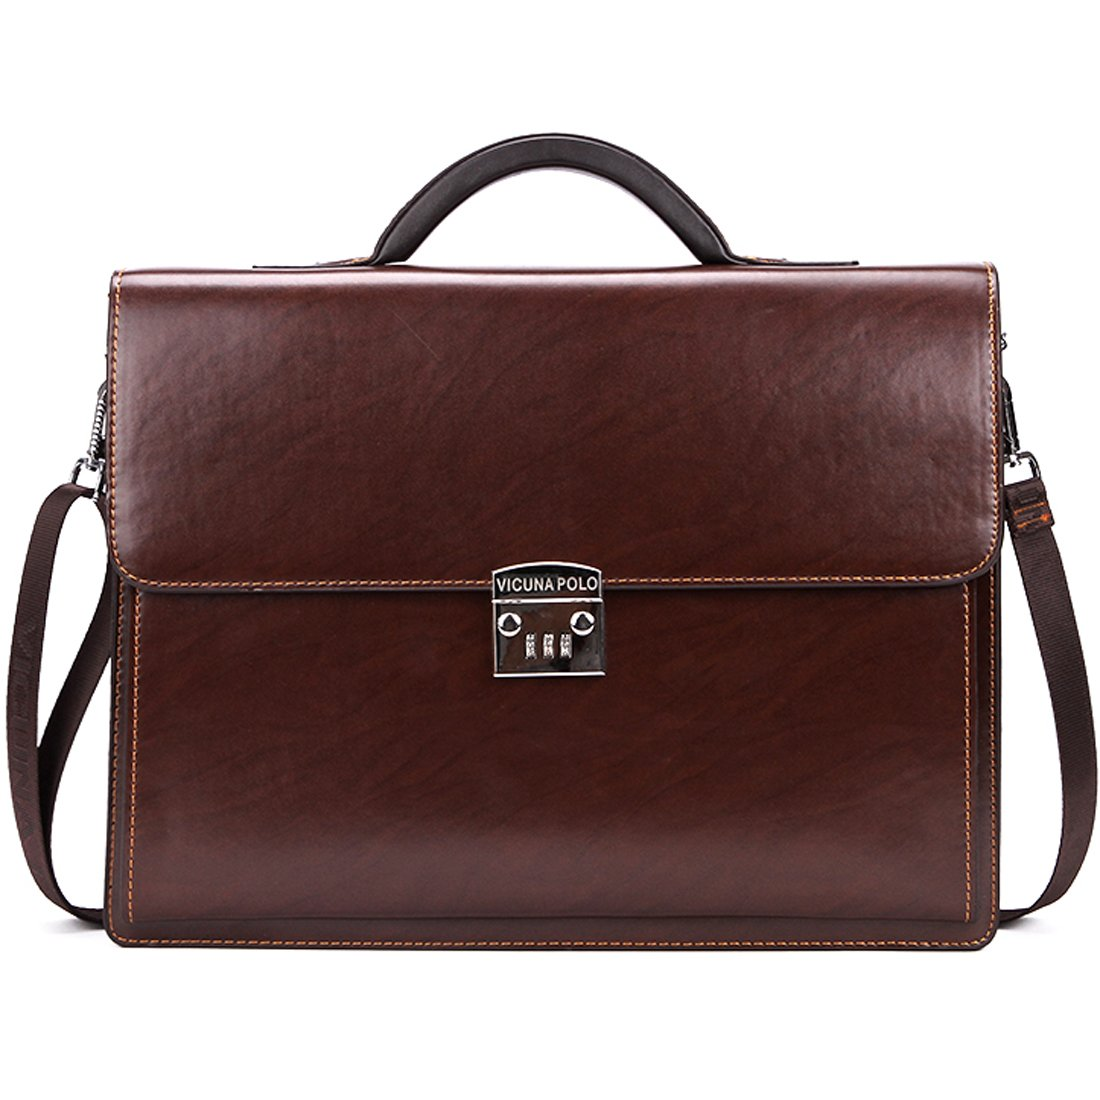 VICUNA POLO Briefcase For Men Handbag Business Man Bag Laptop Bag With Code-Lock (brown)